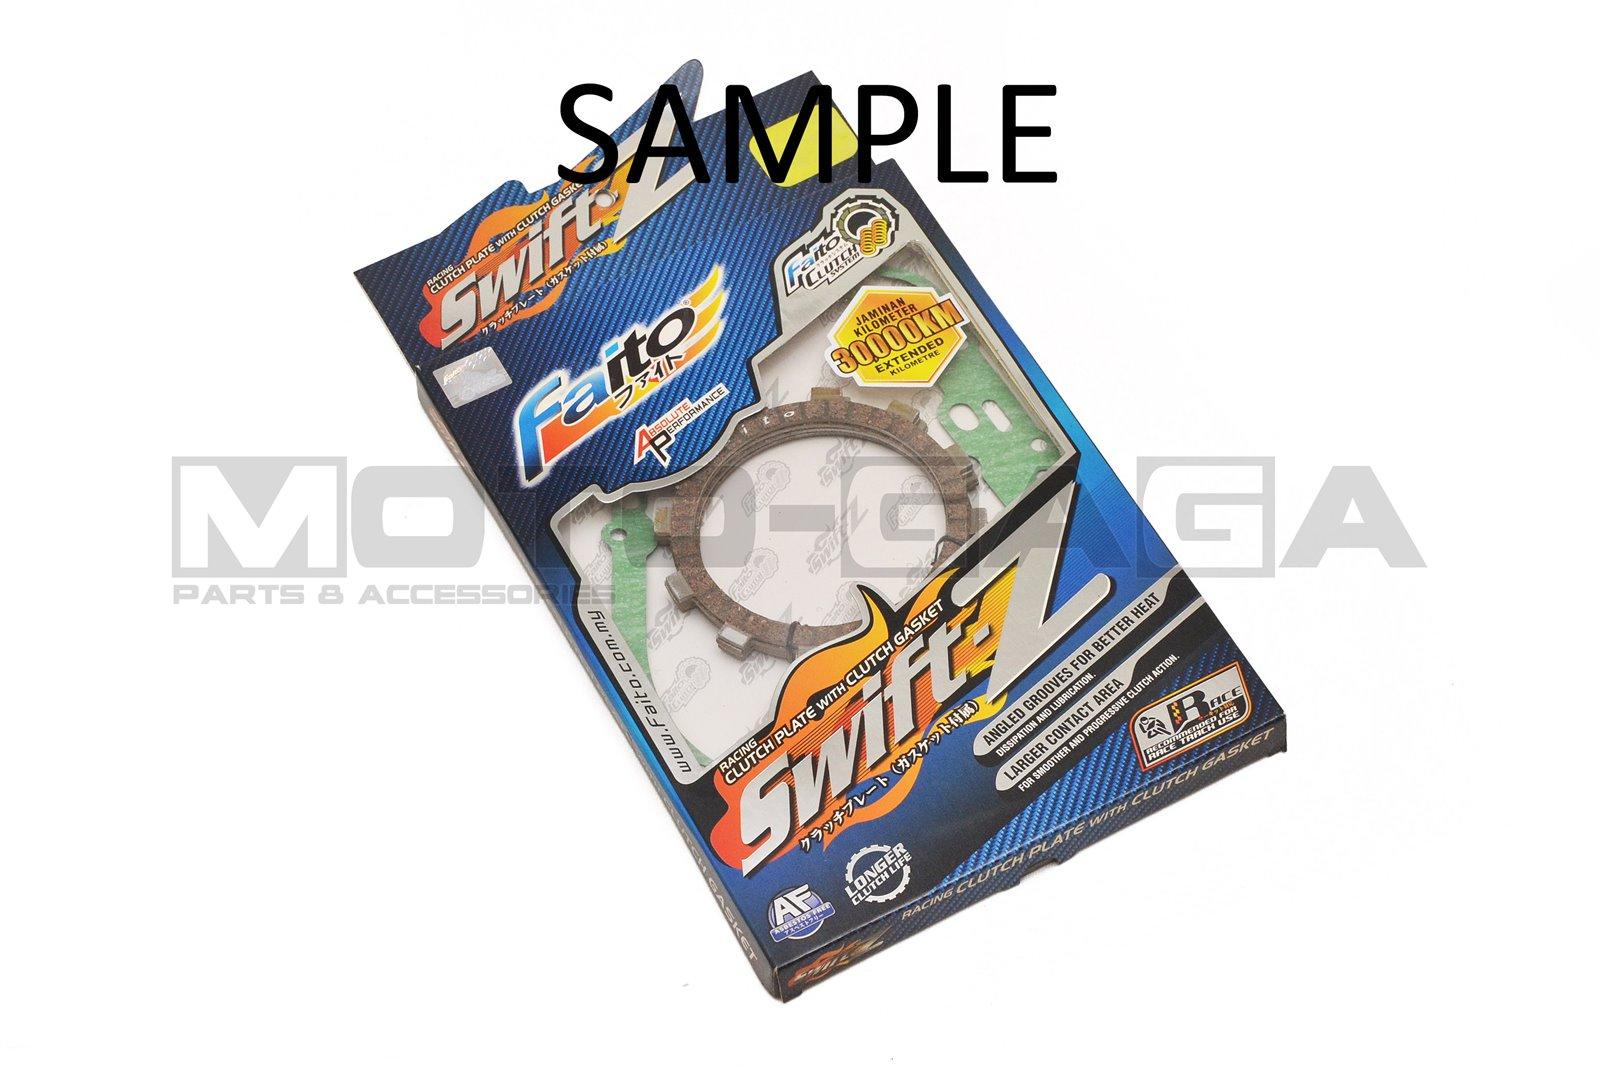 Faito Racing Clutch Plates - Modenas Kriss 110